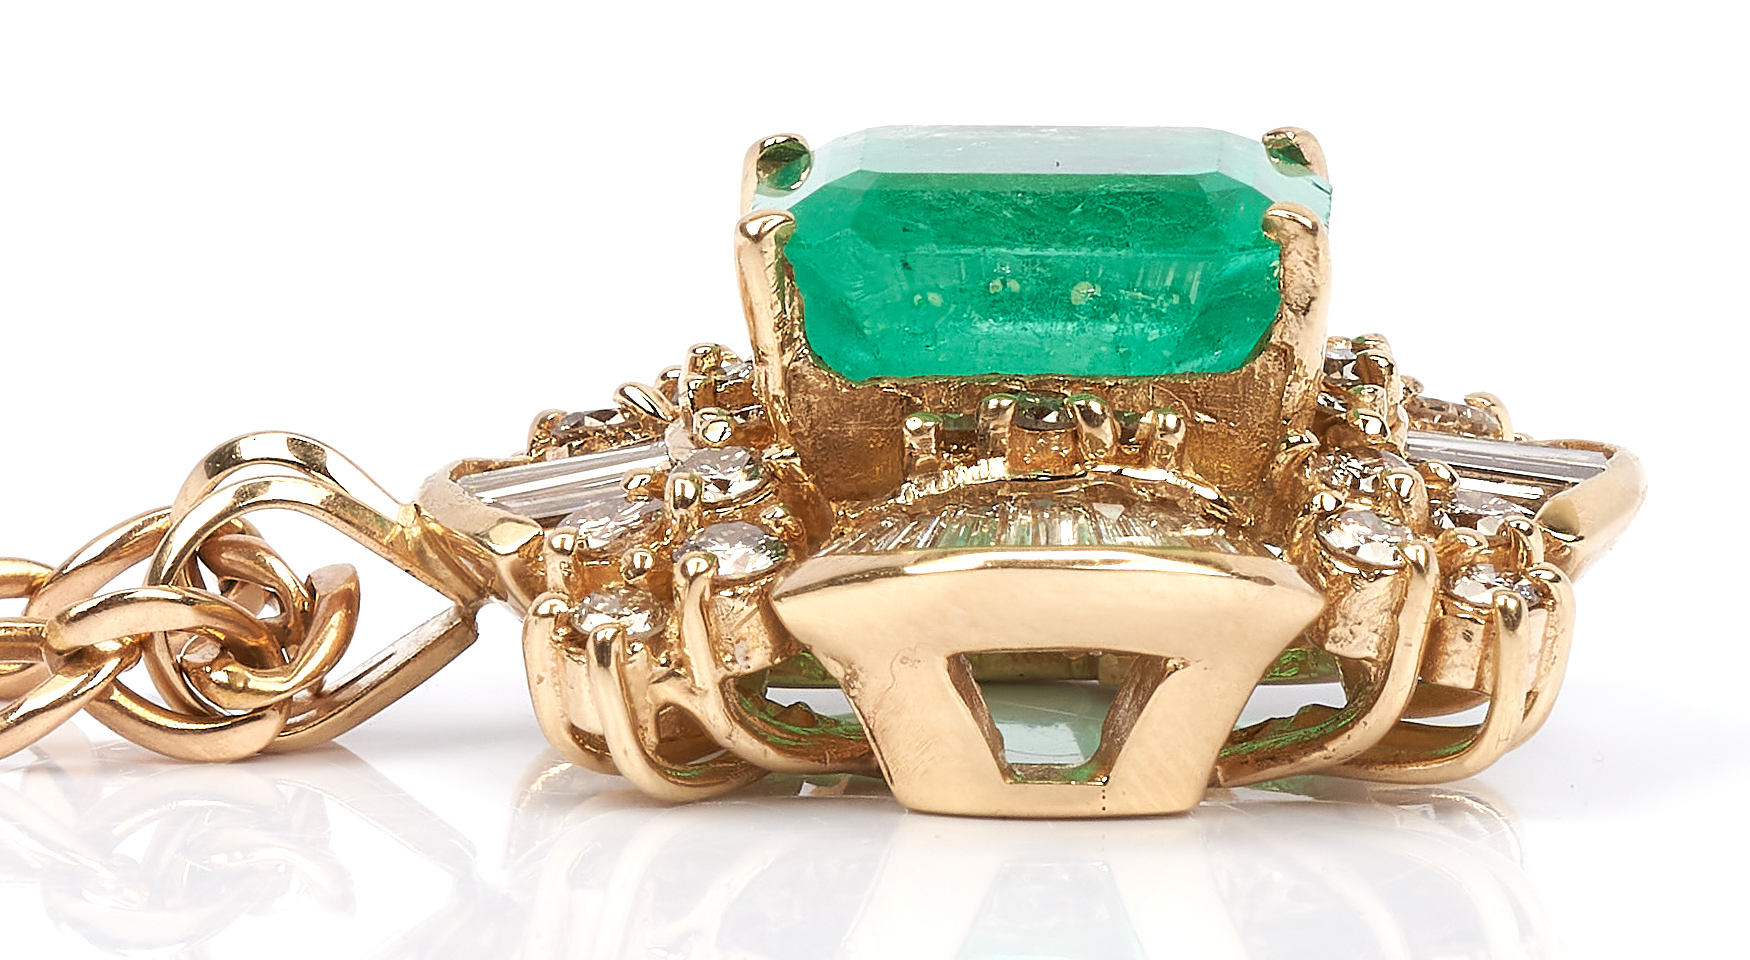 Lot 255: Ladies 11 Carat Emerald, Gold, & Diamond Pendant & Necklace